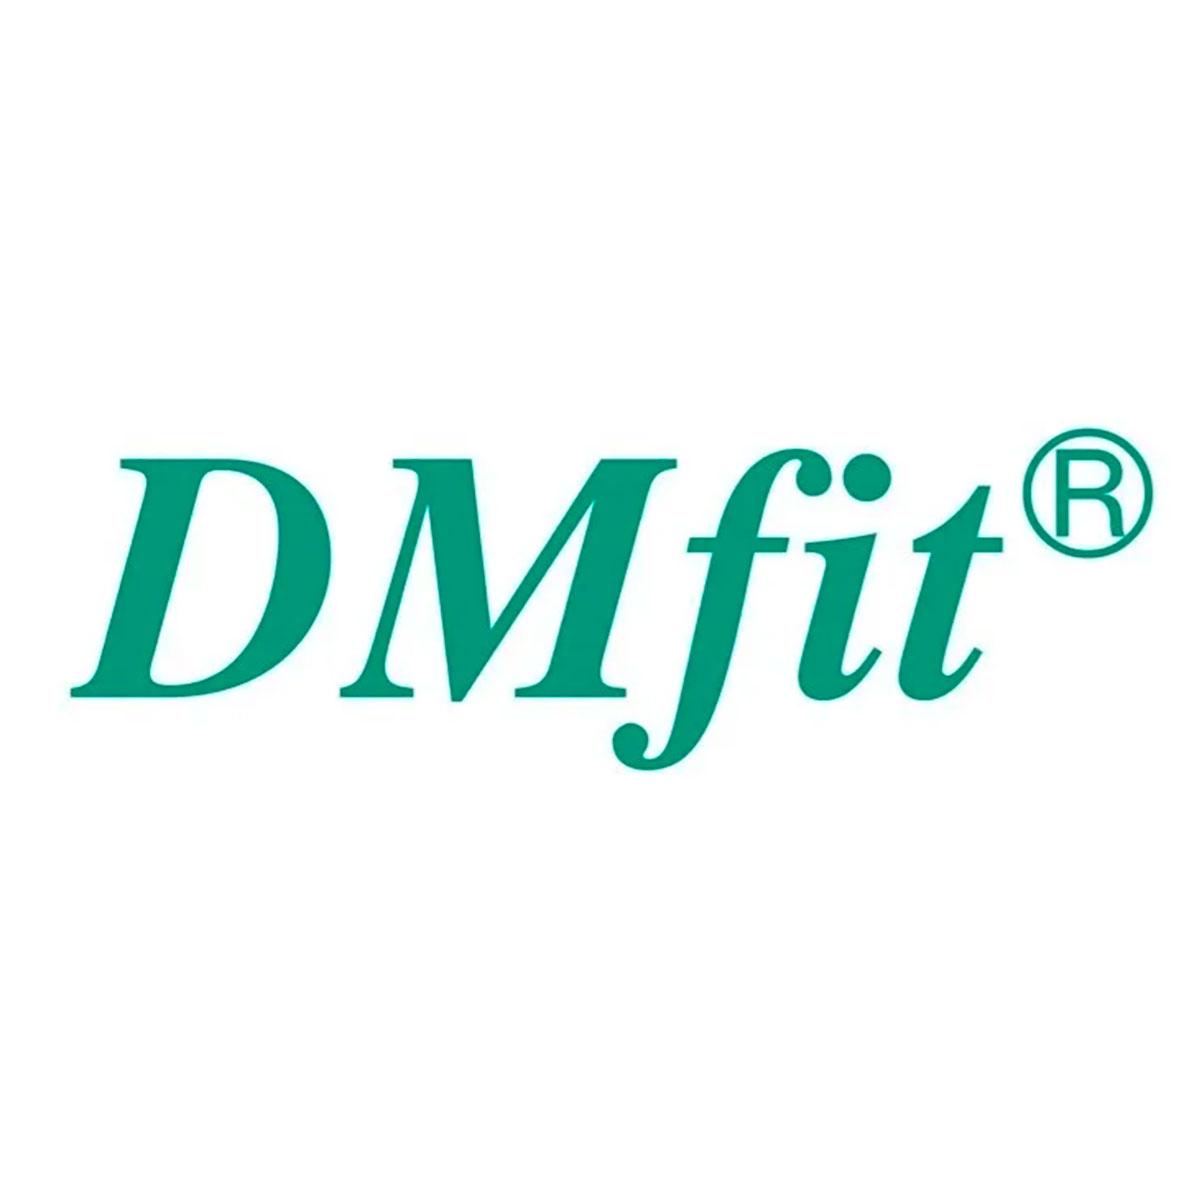 DMFIT - Filtro 100 Mesh 3/8 X 3/8 engate rápido